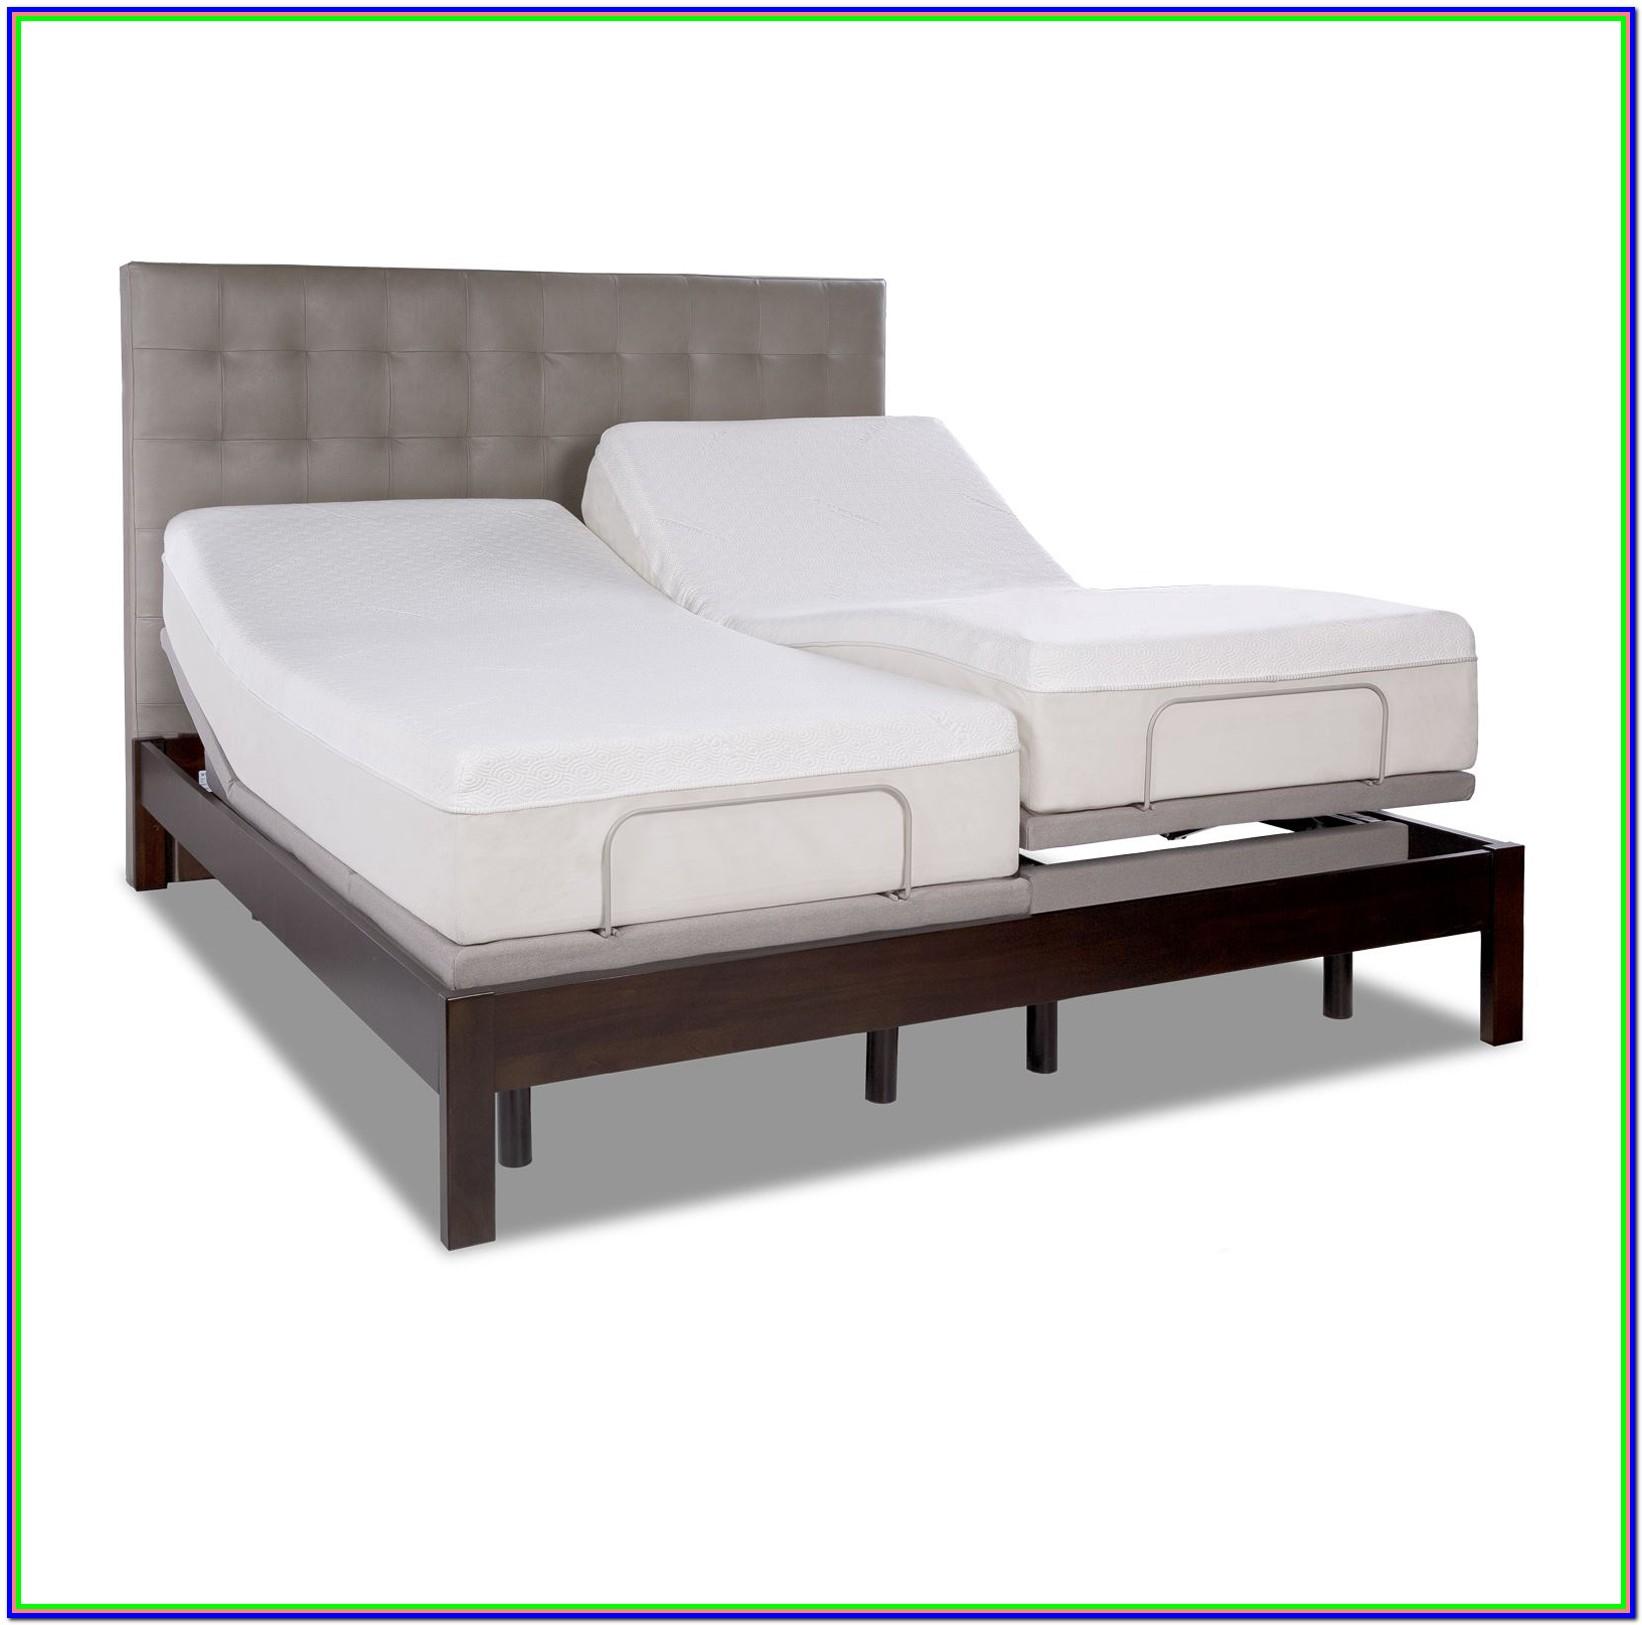 Tempur Pedic Bed Frame Remote